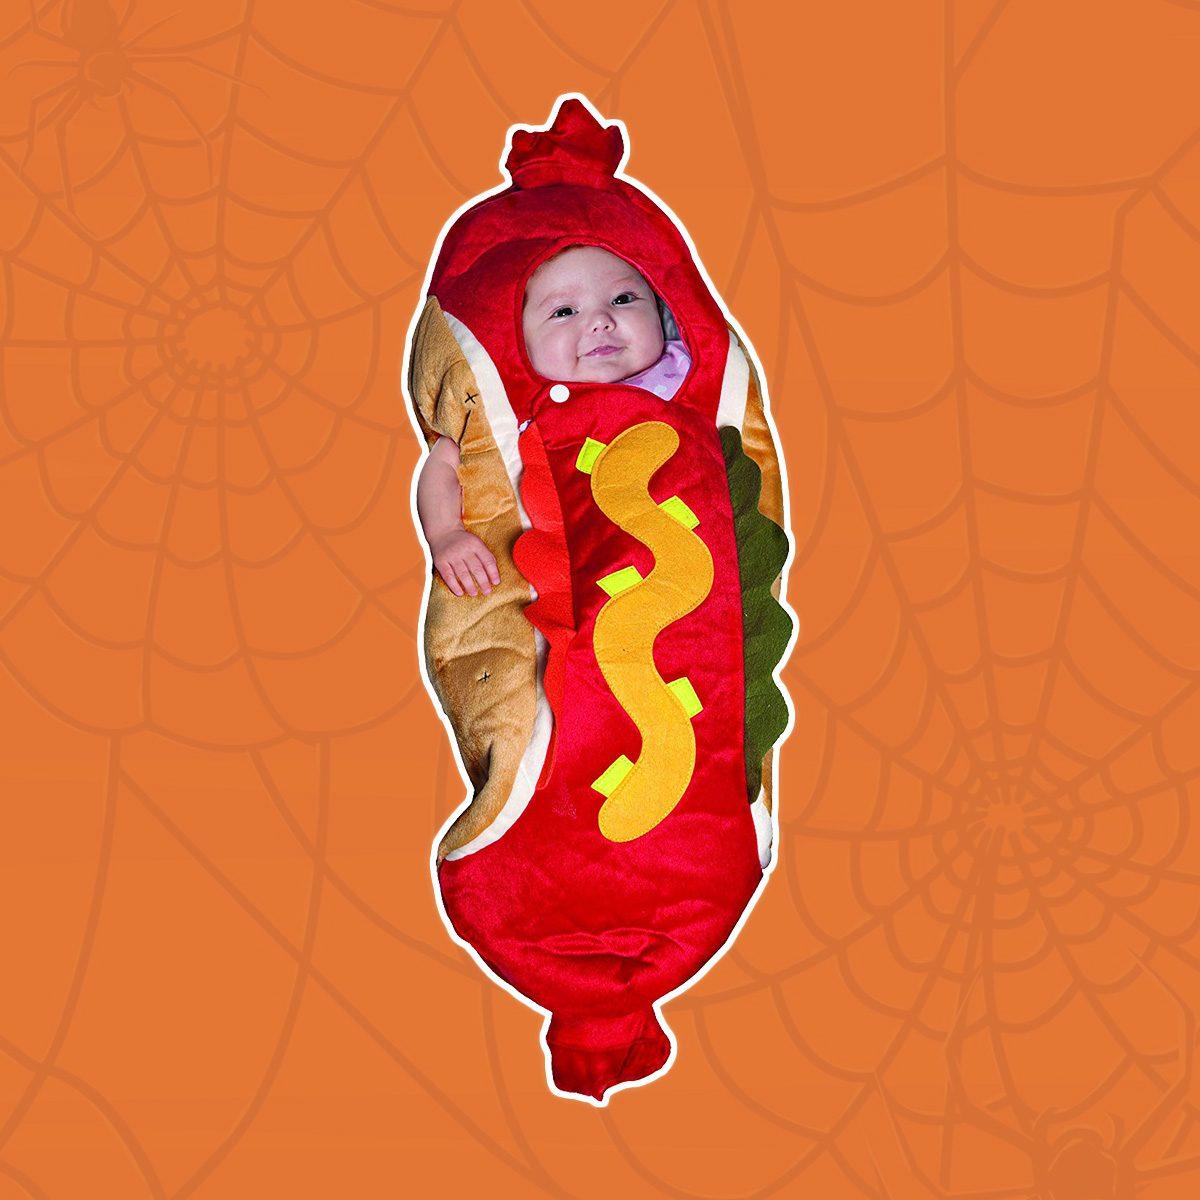 Baby hot dog